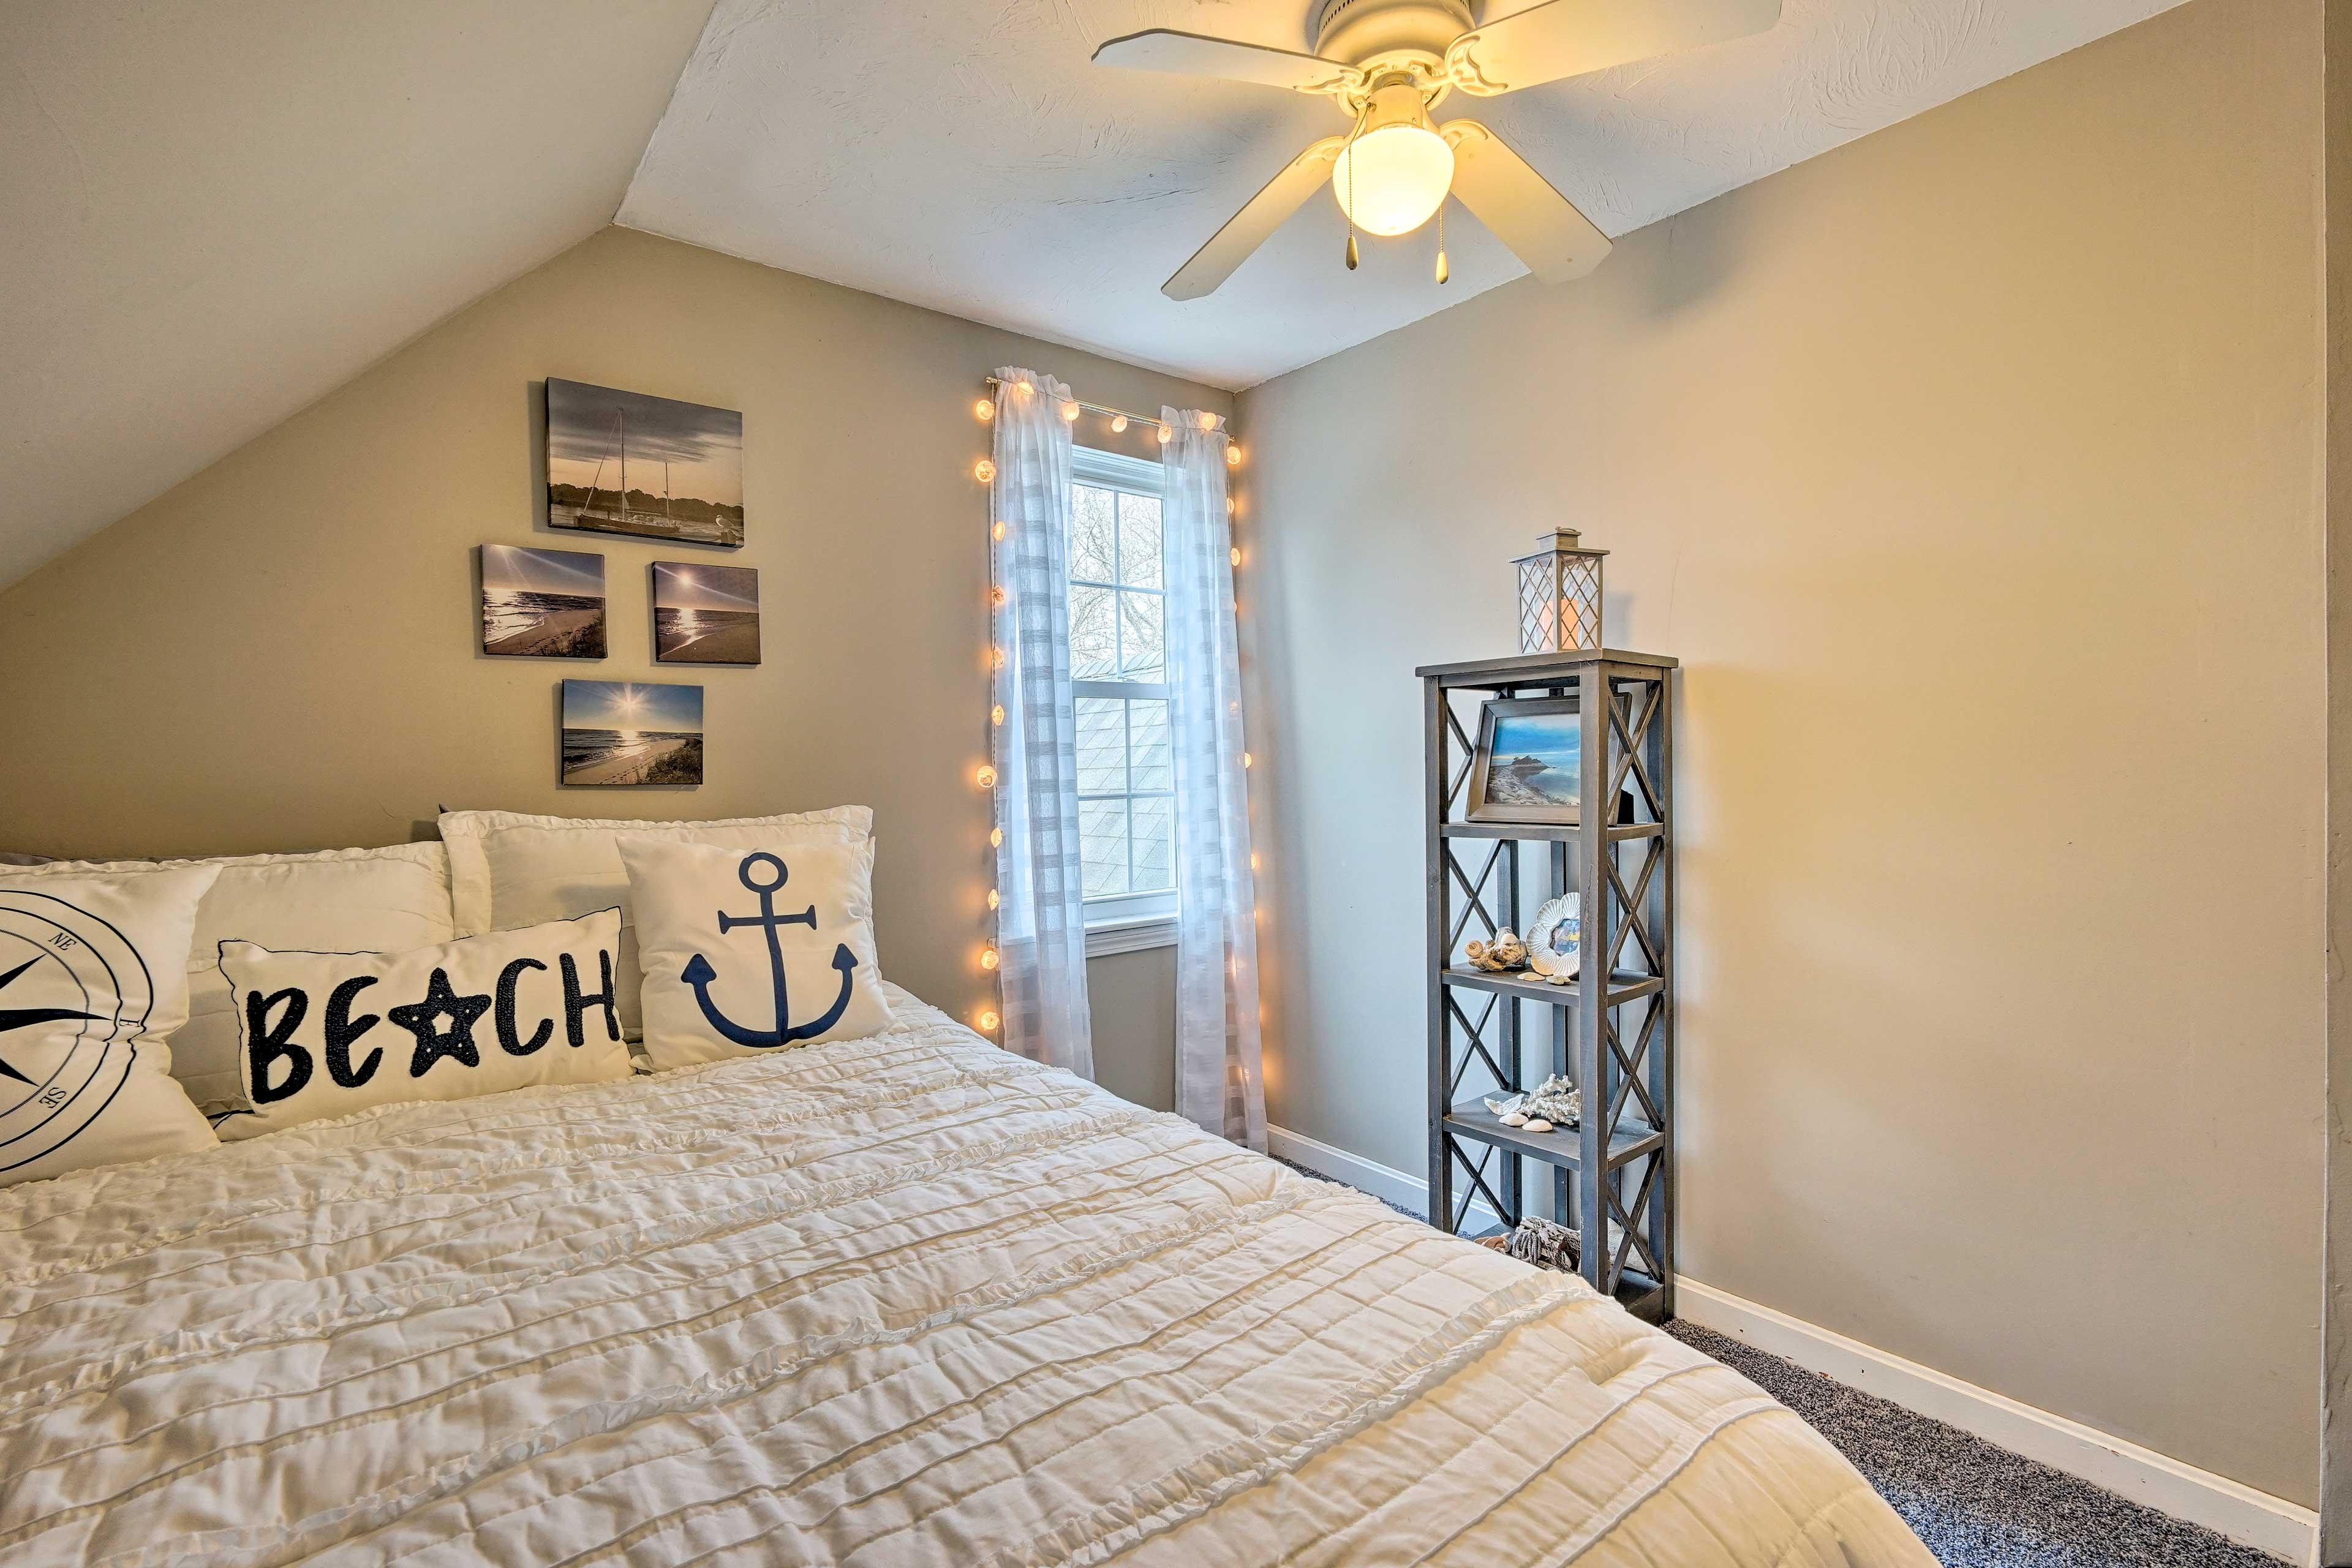 This room has tasteful beach-style decor and fairy lights!